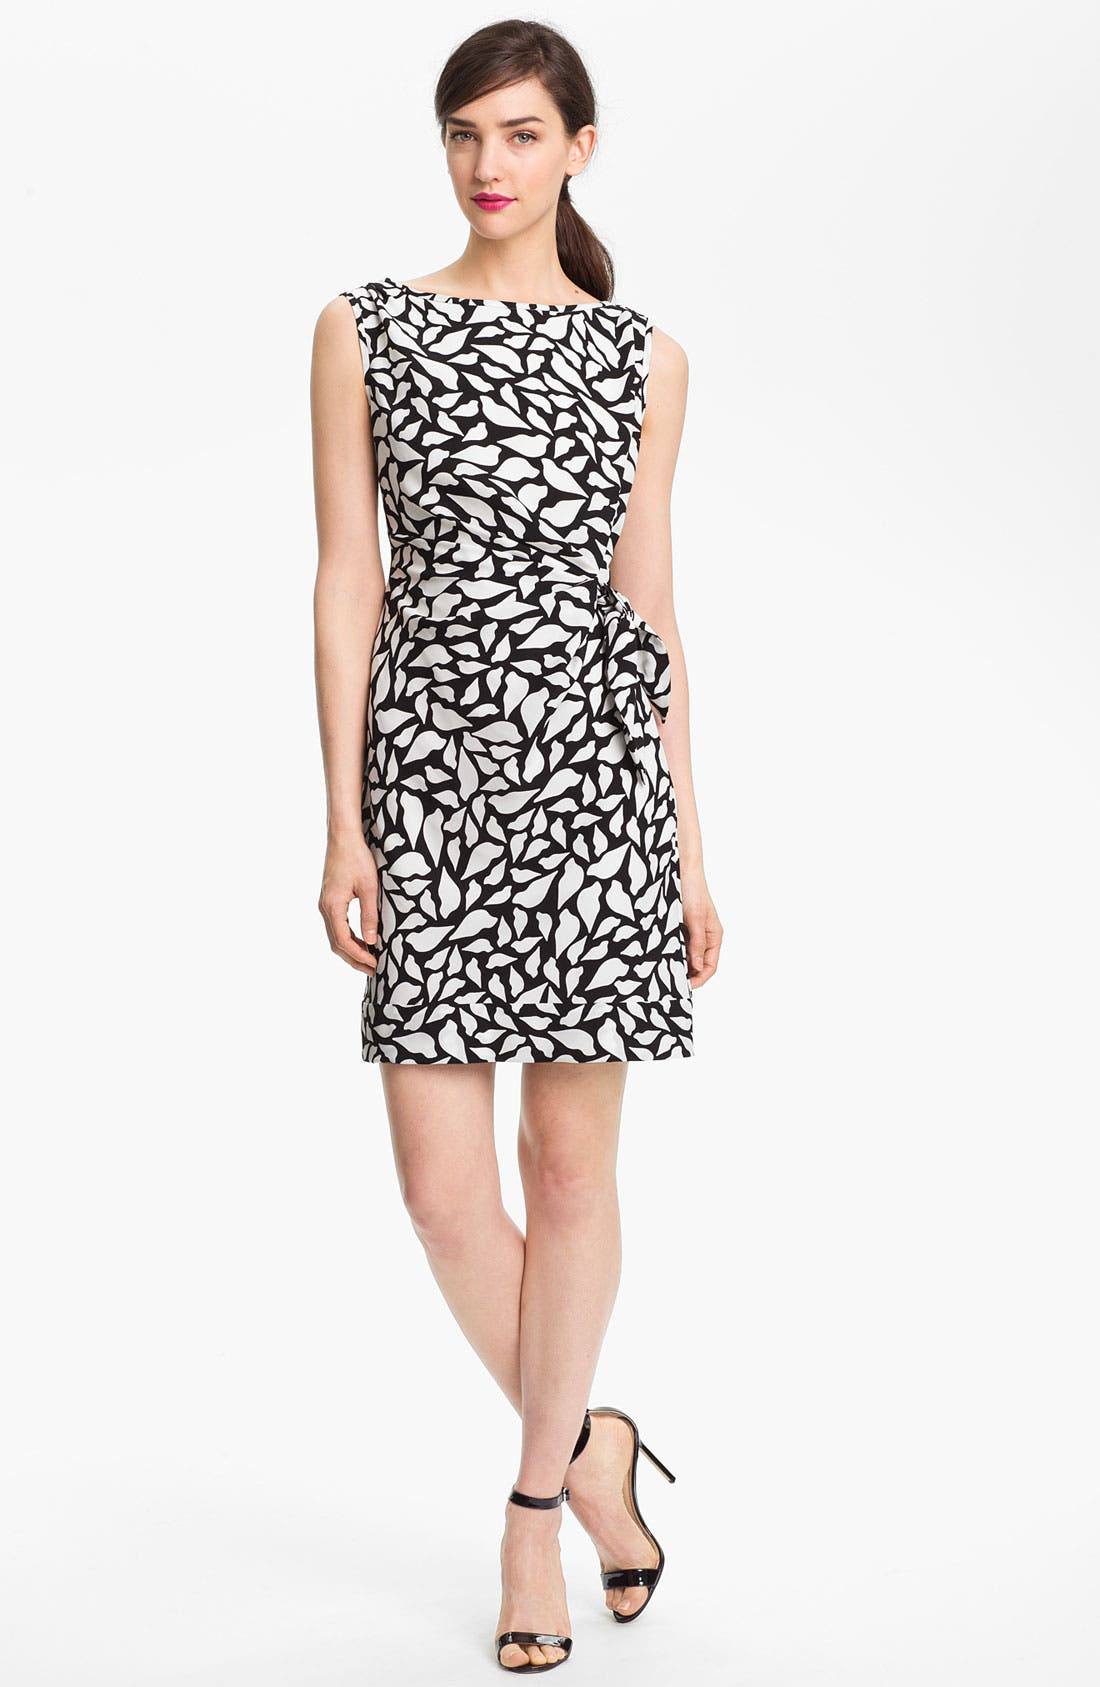 Alternate Image 1 Selected - Diane von Furstenberg 'New Della' Stretch Silk Sheath Dress